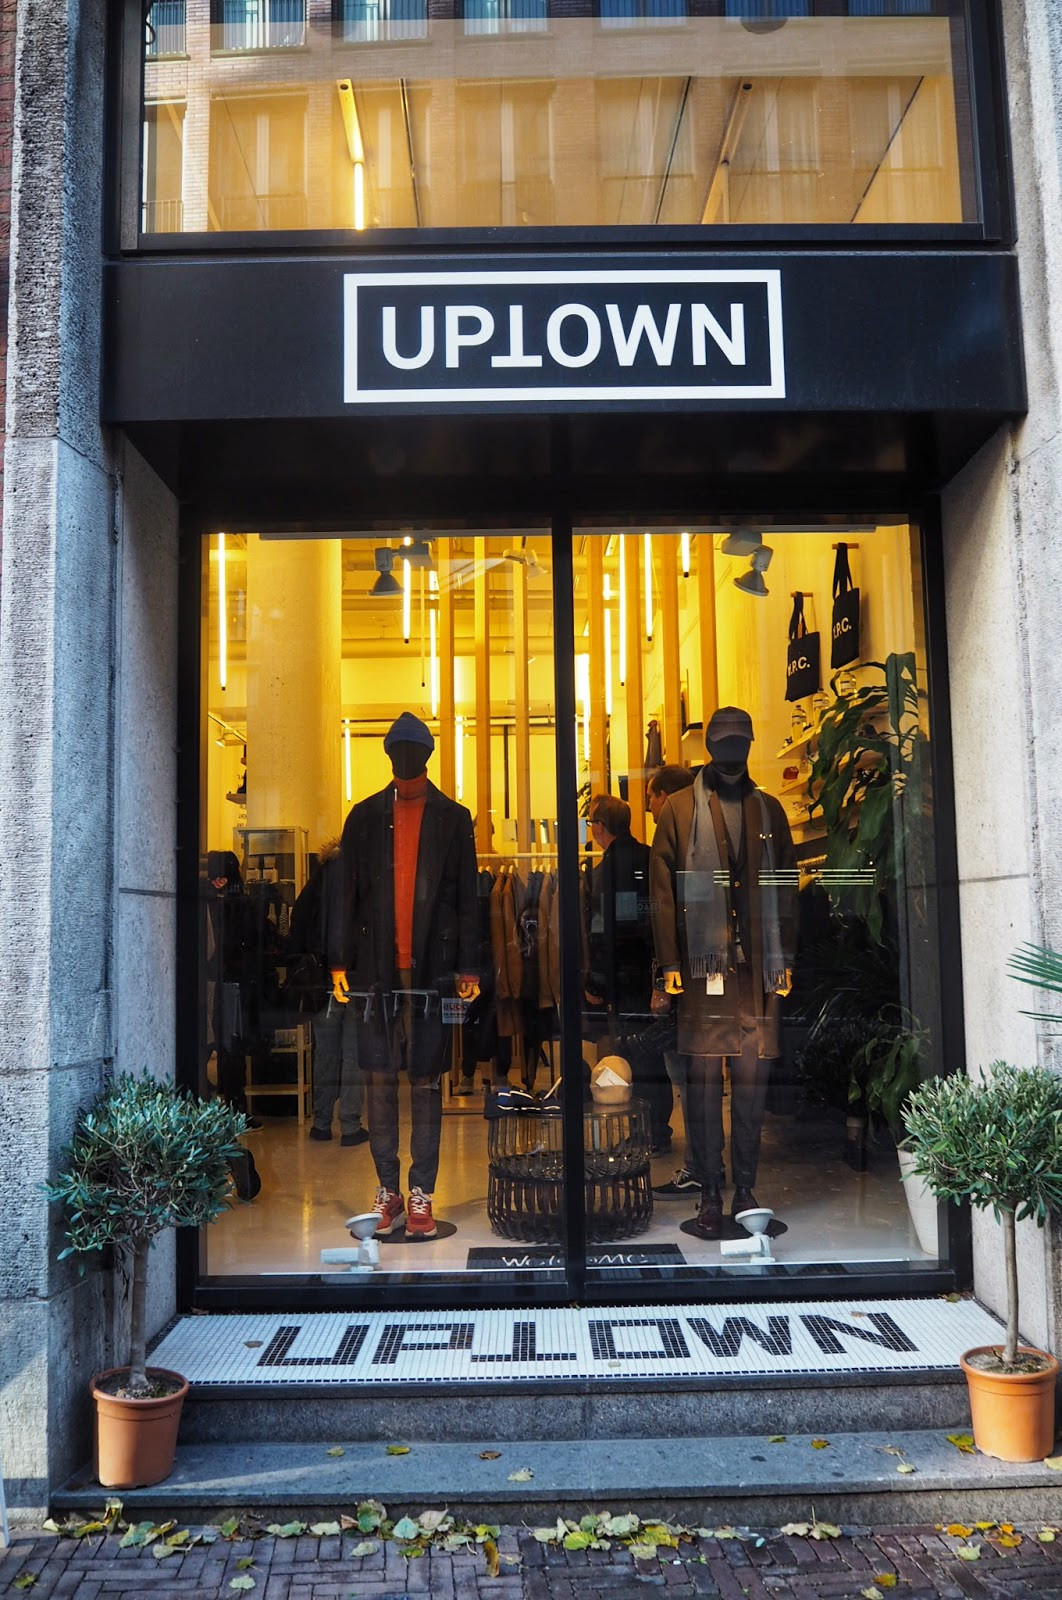 Shopping in Uptown Den Haag